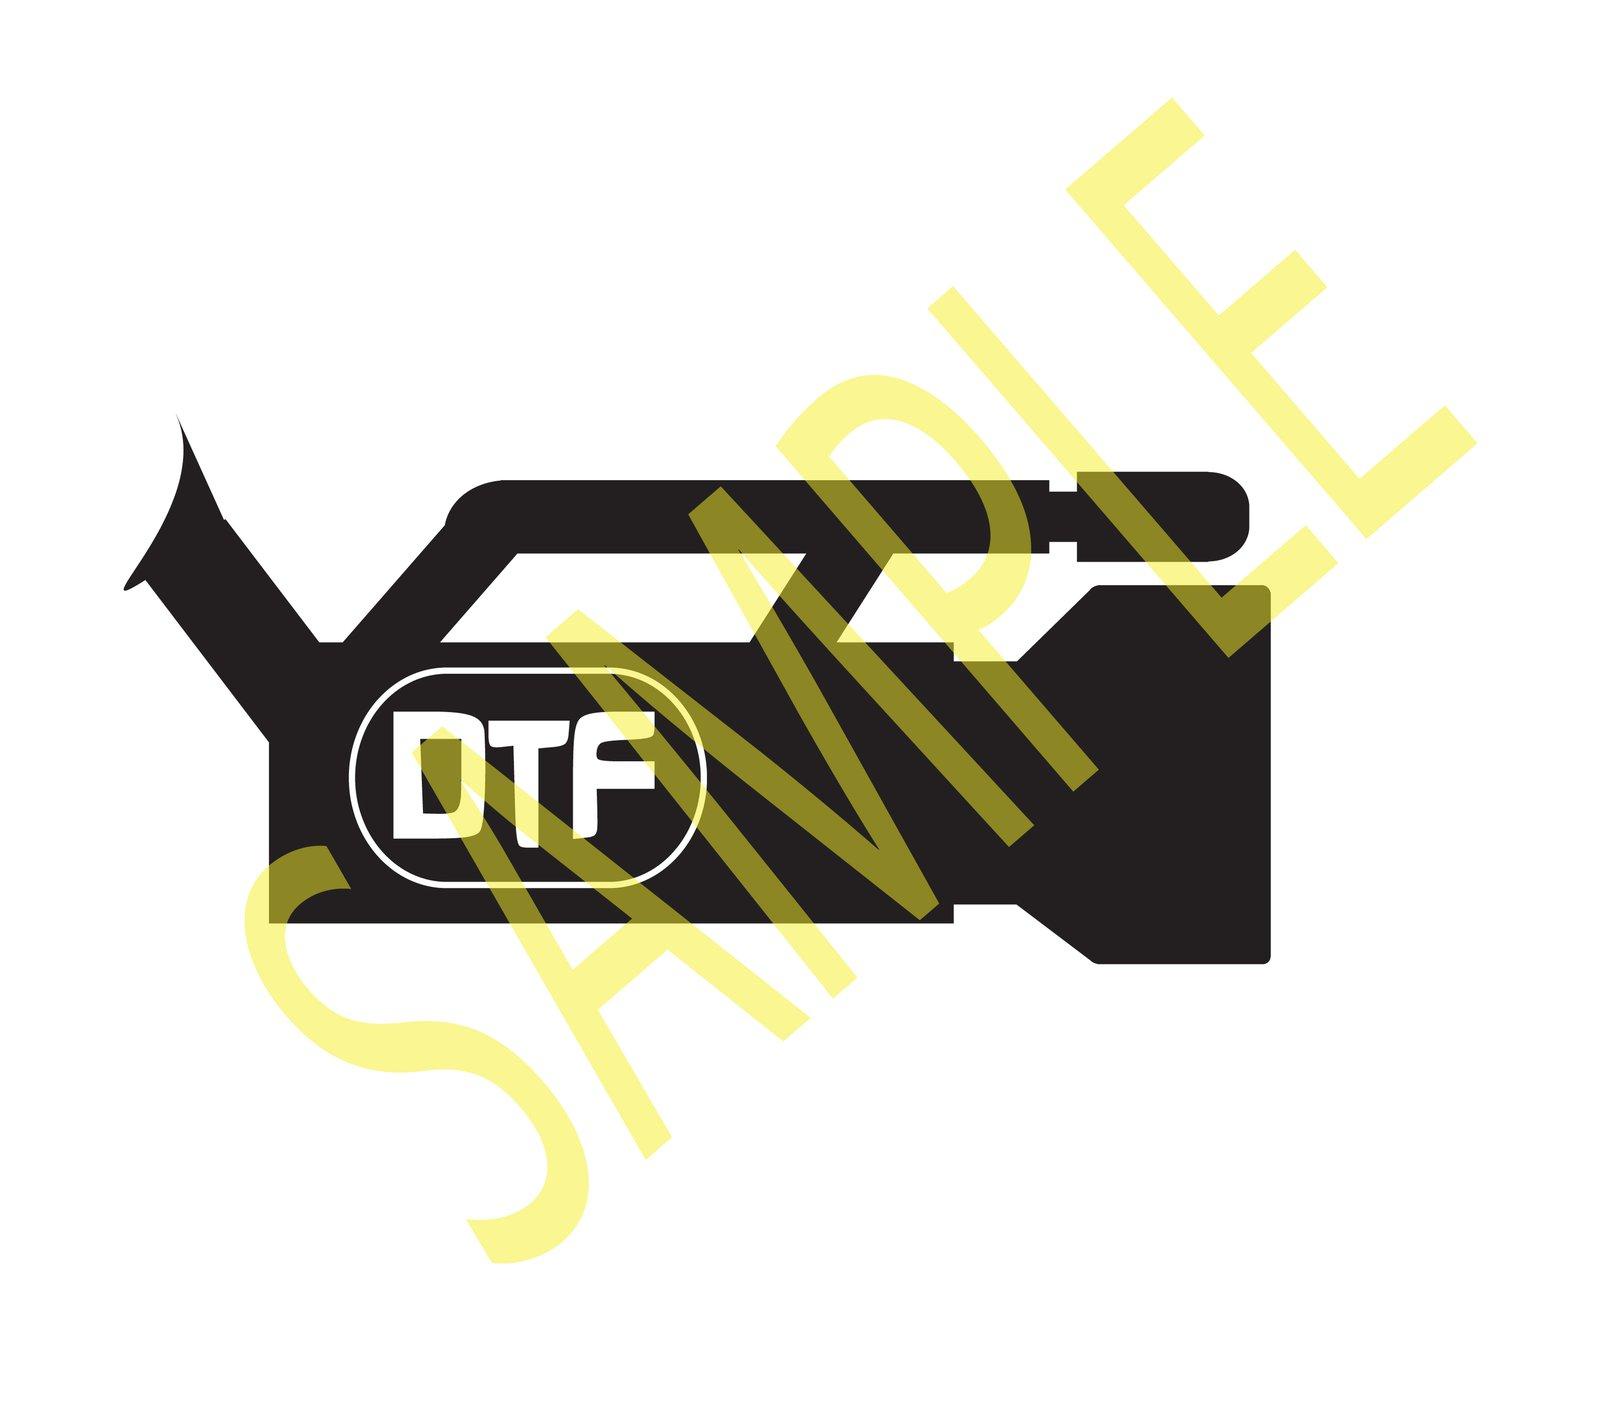 Dtf camera sample